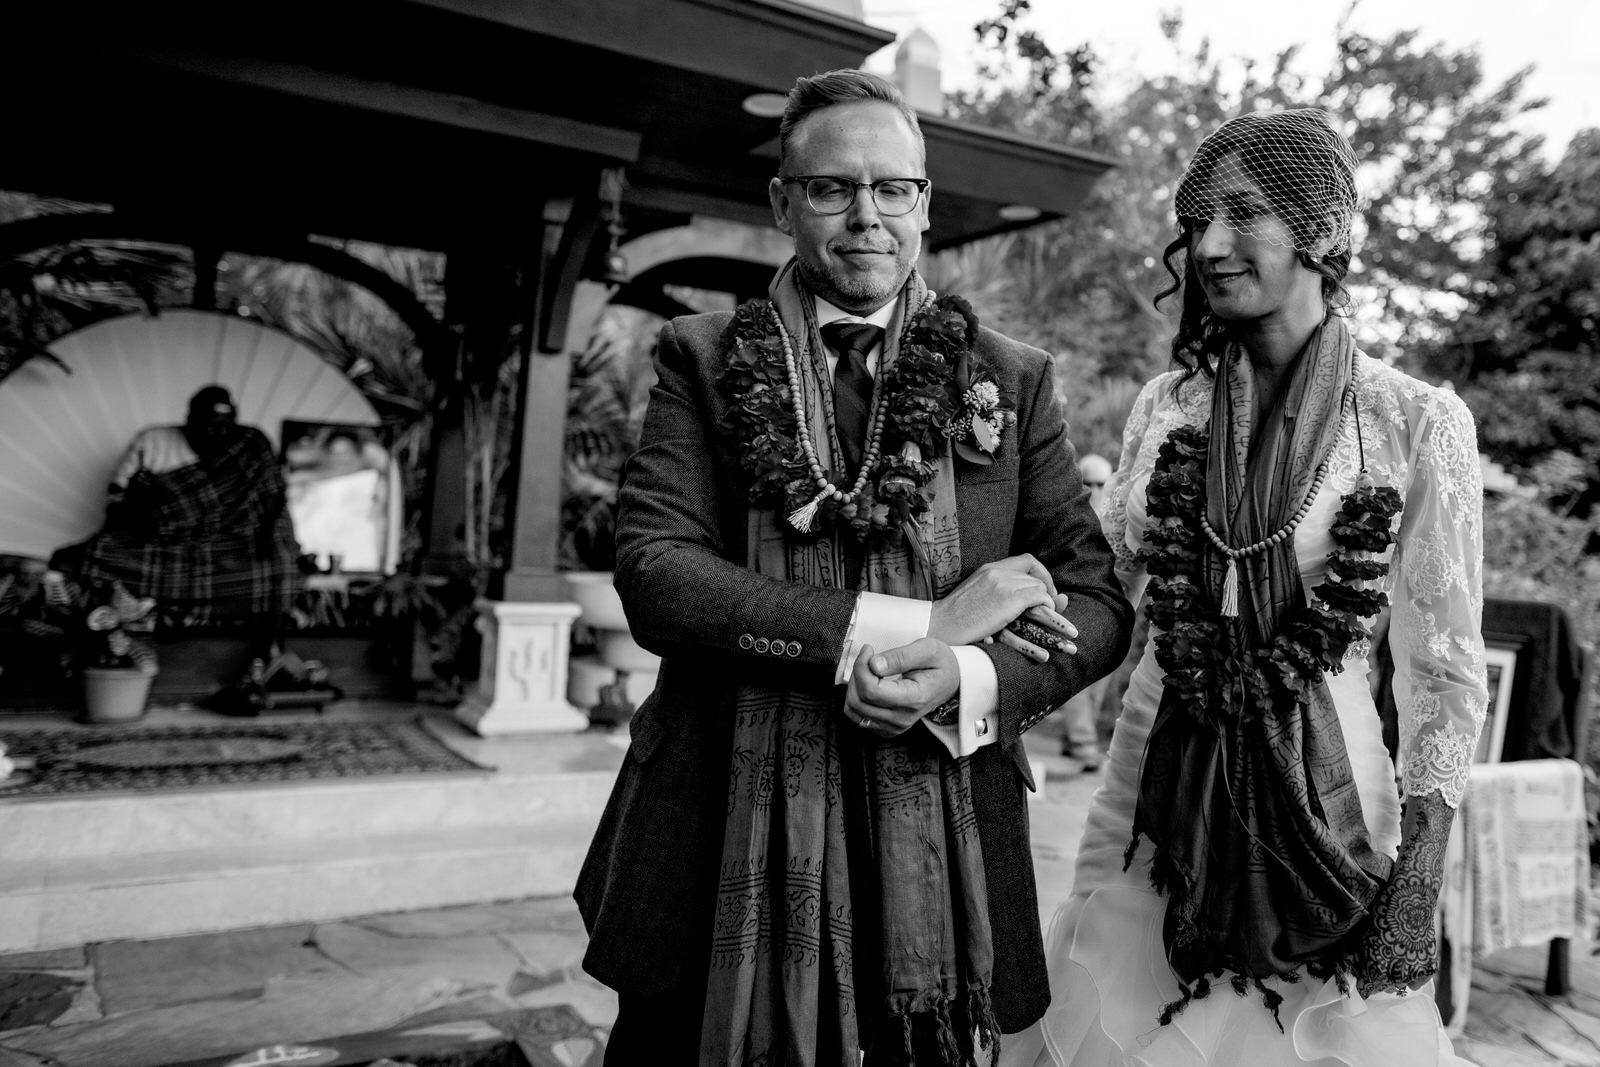 kashi-ashram-wedding-ceremony-black-and-white-emotional-ritual-ceremony.jpg